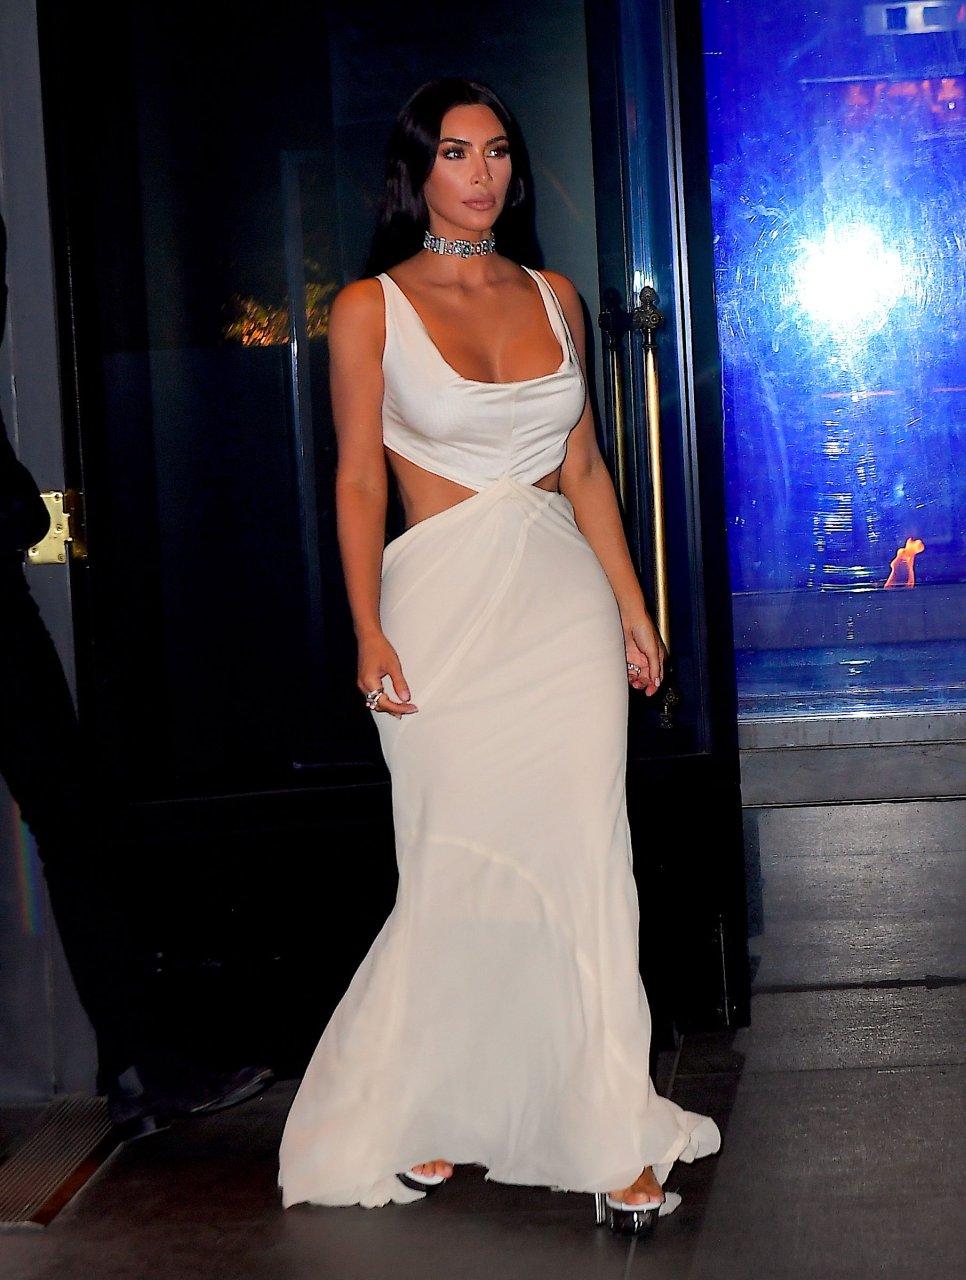 Kim-Kardashian-Sexy-TheFappeningBlog.com-33.jpg